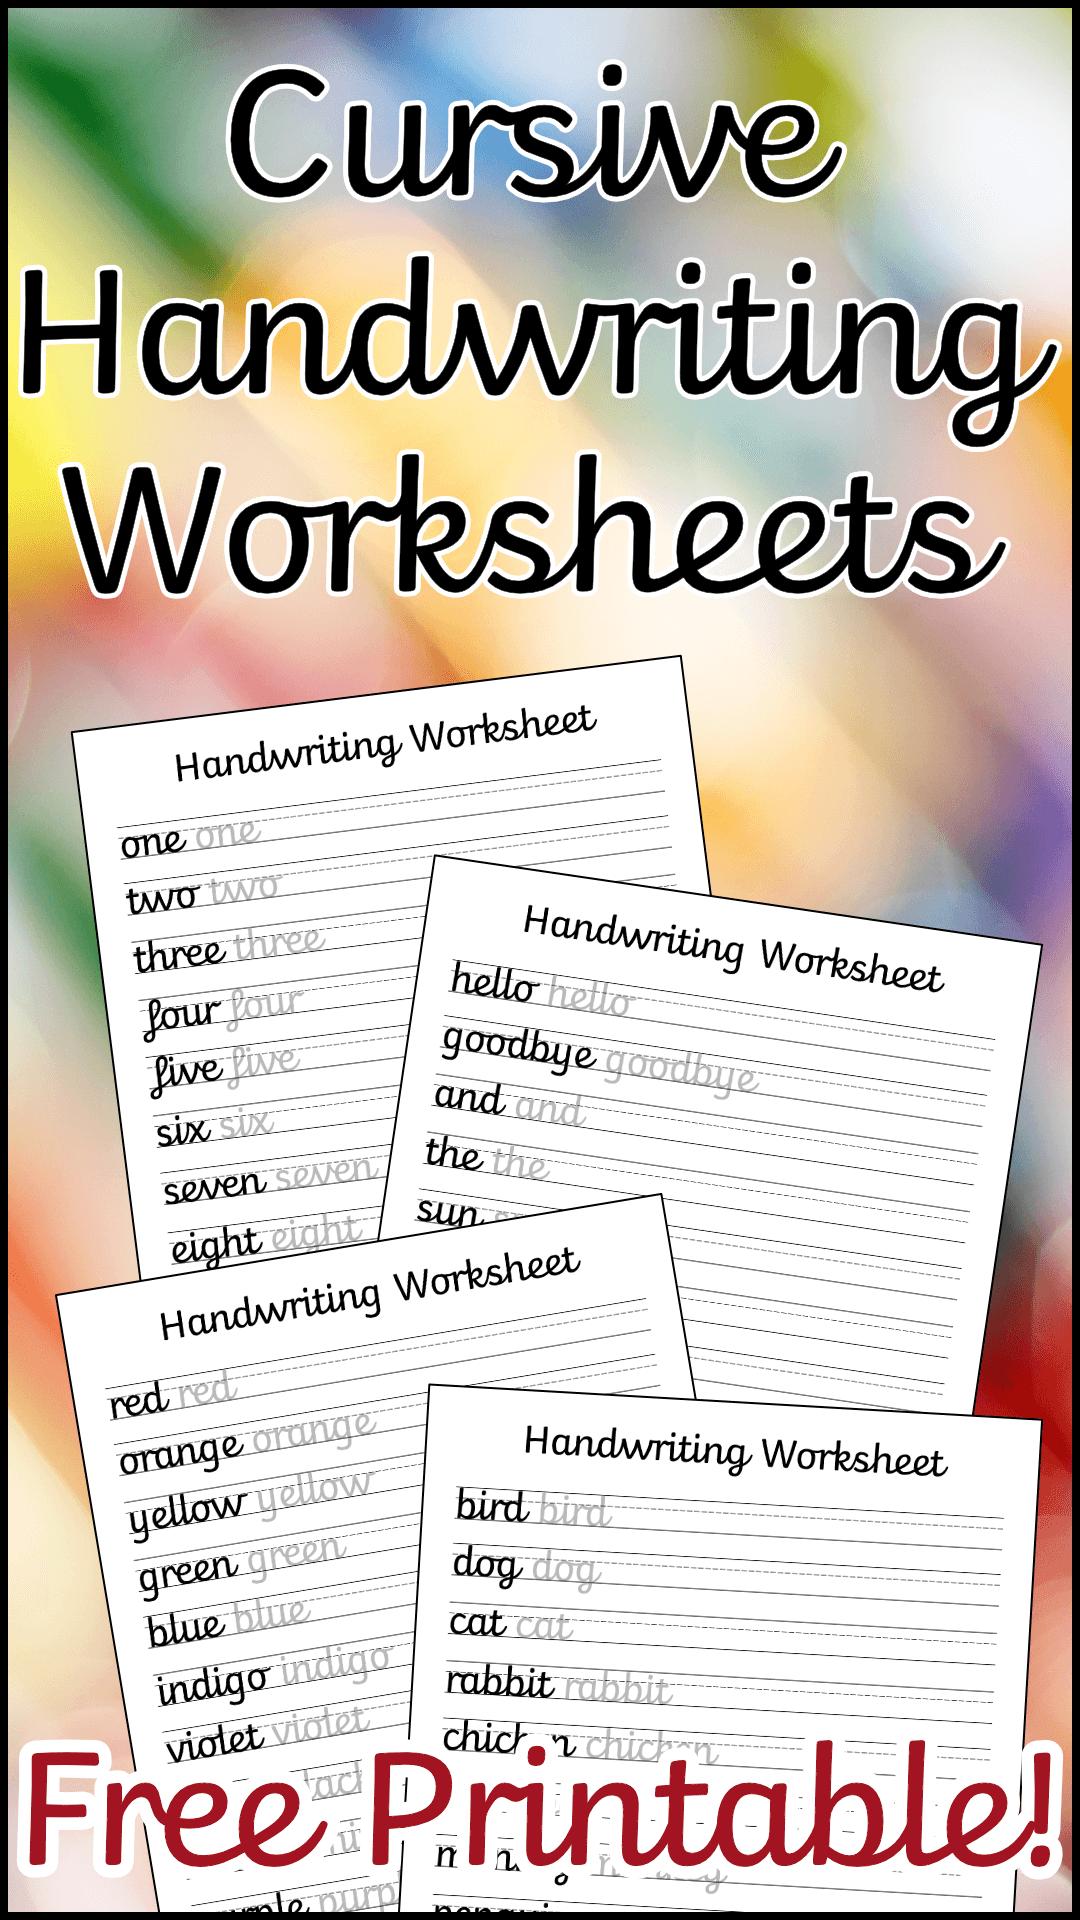 Cursive Handwriting Worksheets Free Printable With